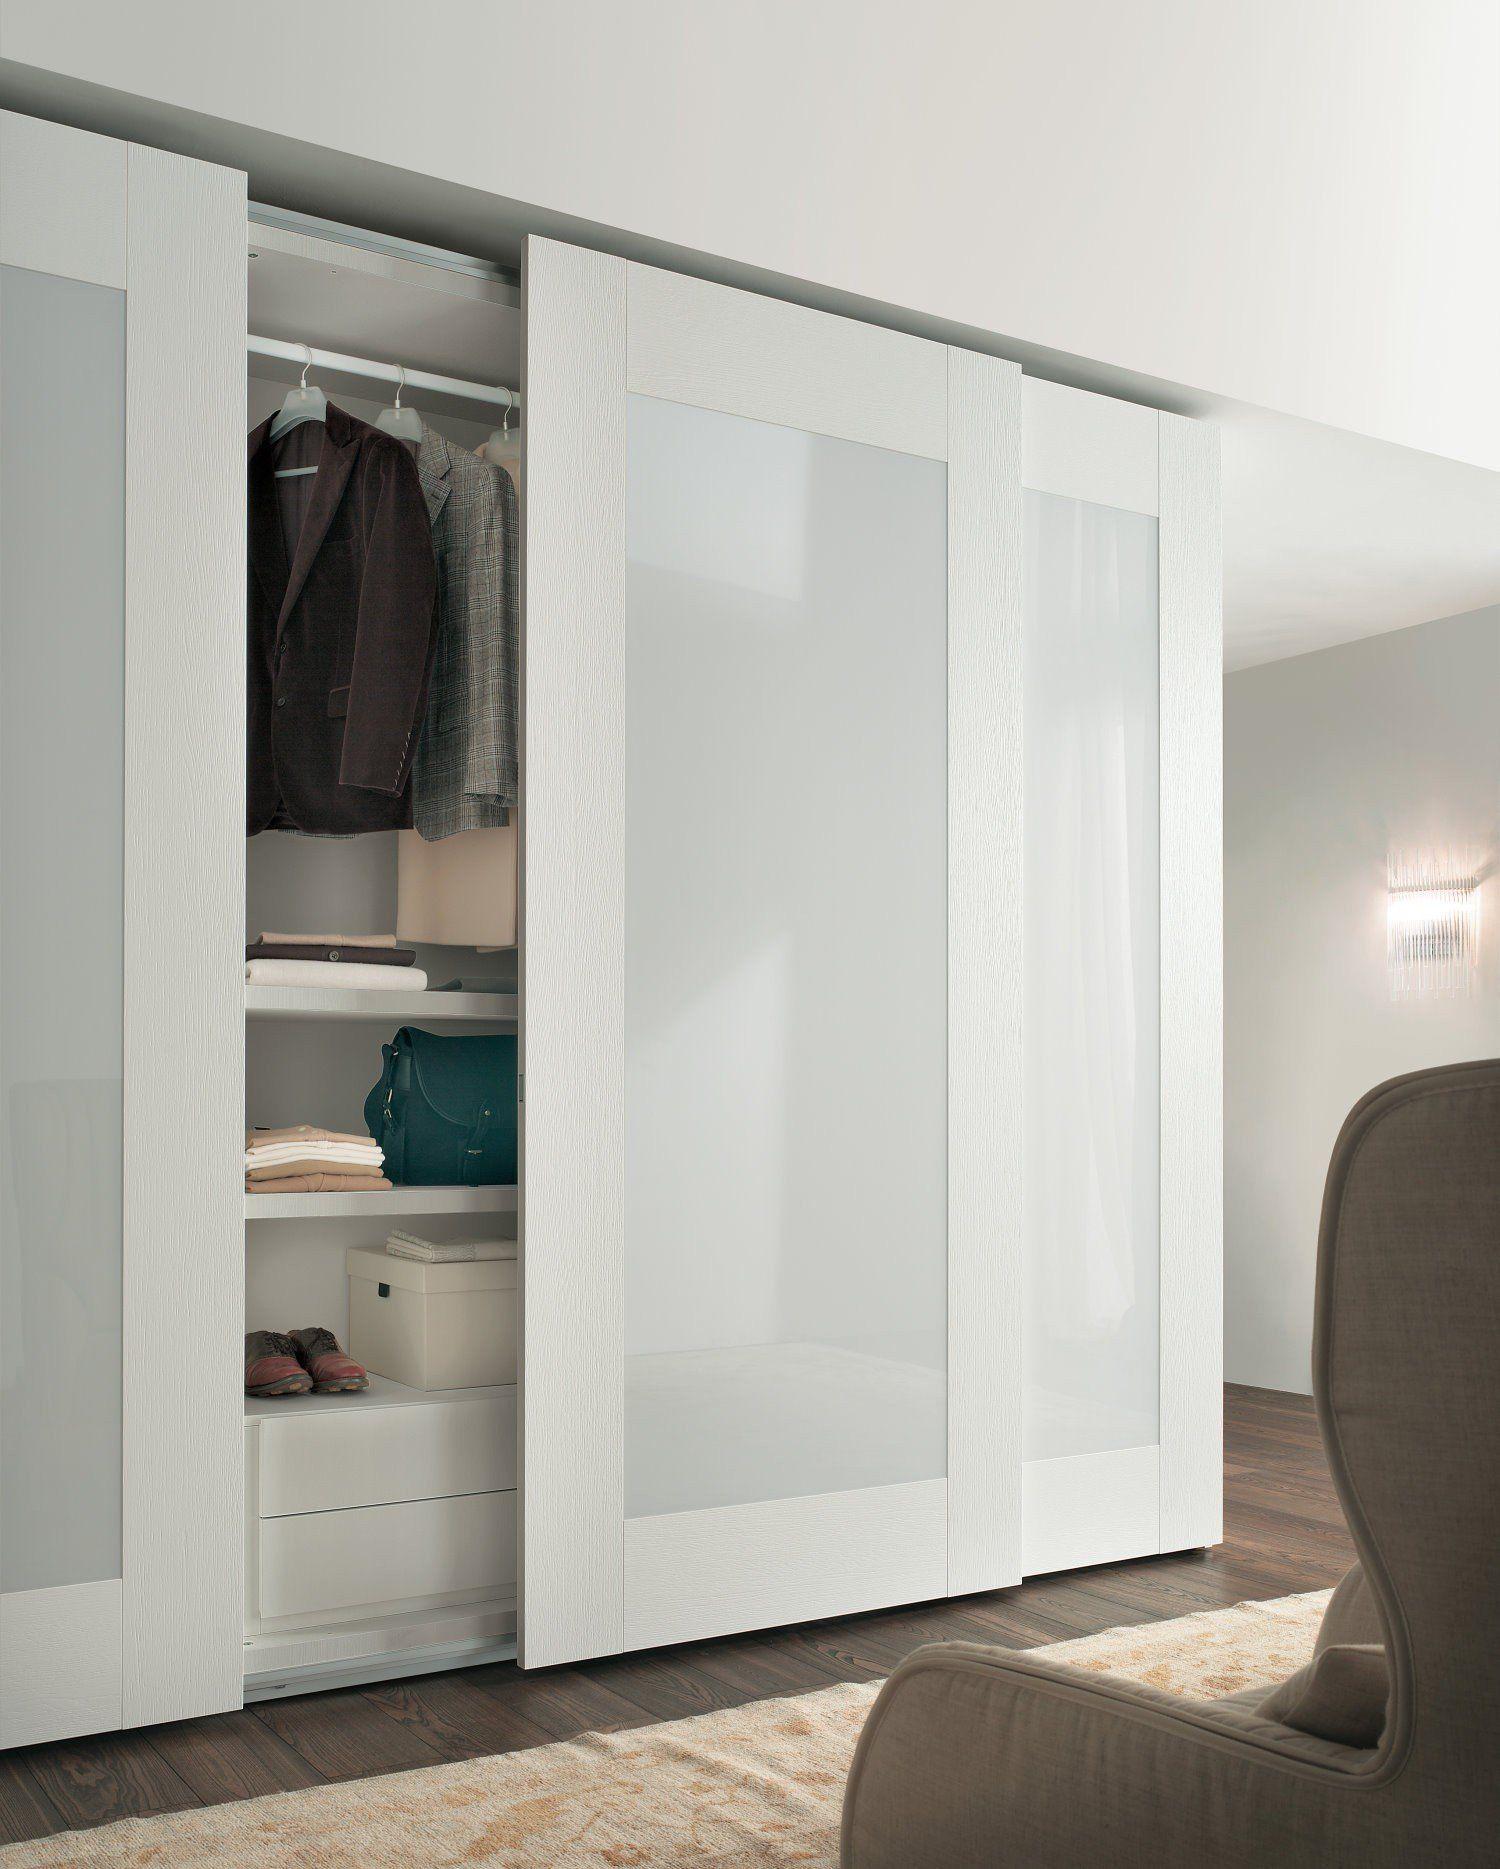 18.SIMPHOME.COM armadio scorrevole con ante a specchio mirror arredaclick